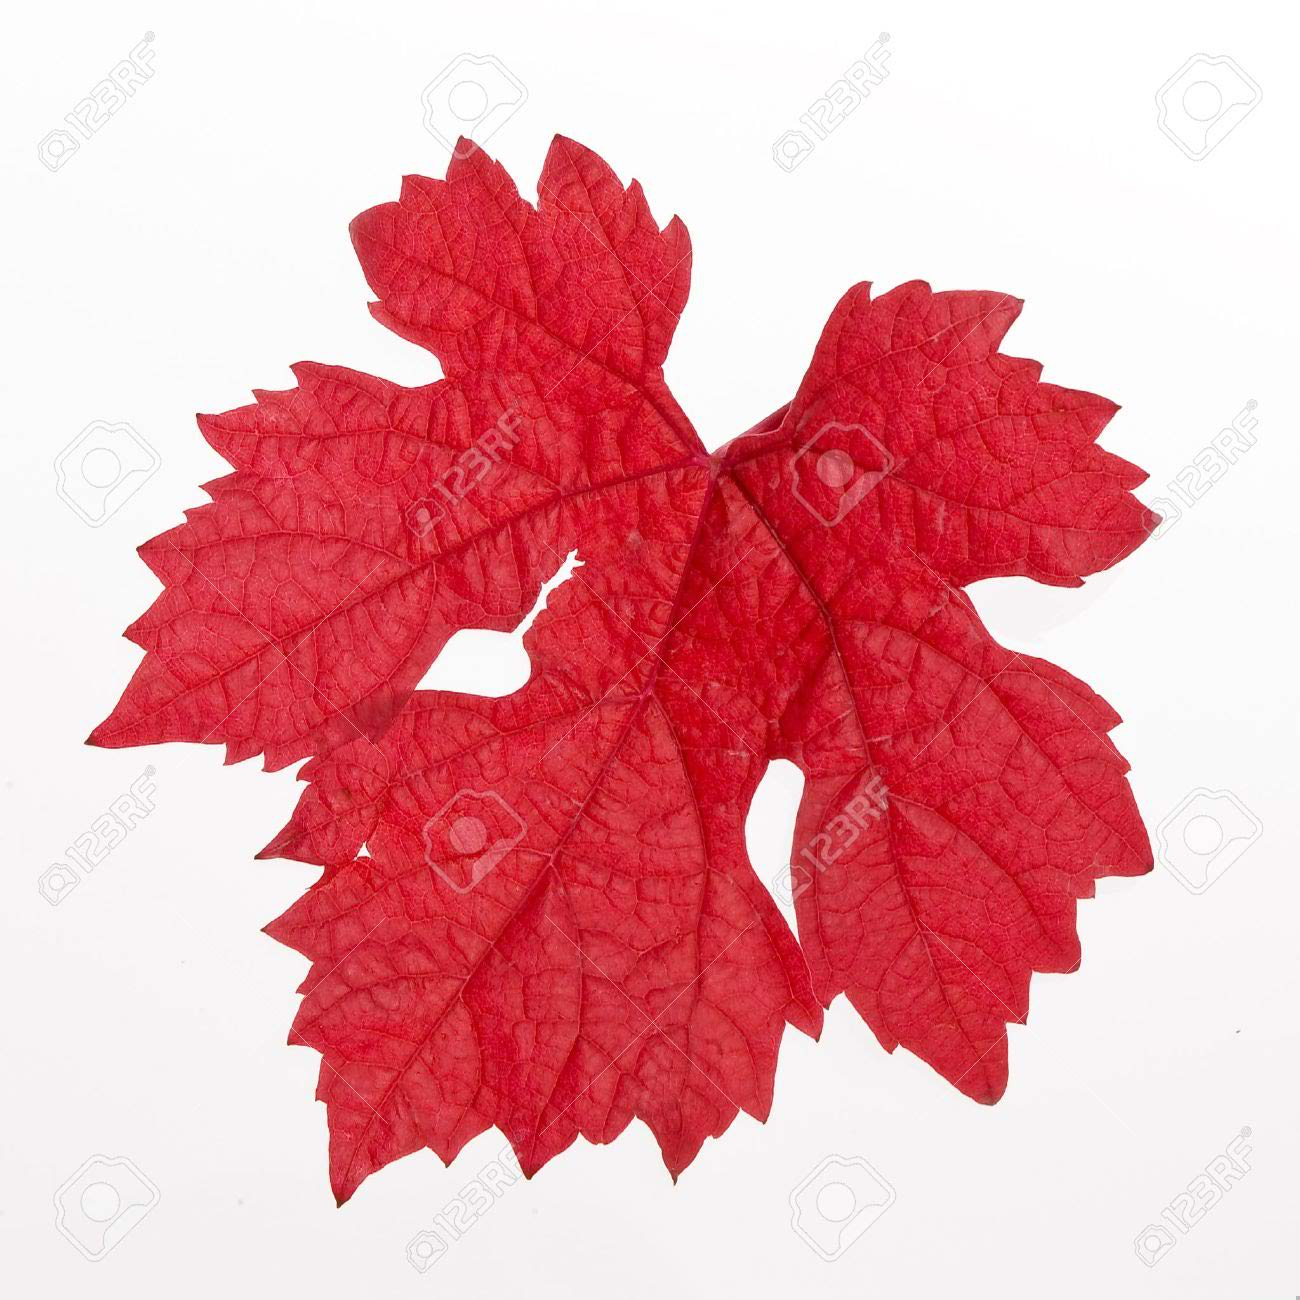 Stunning Red Leaf